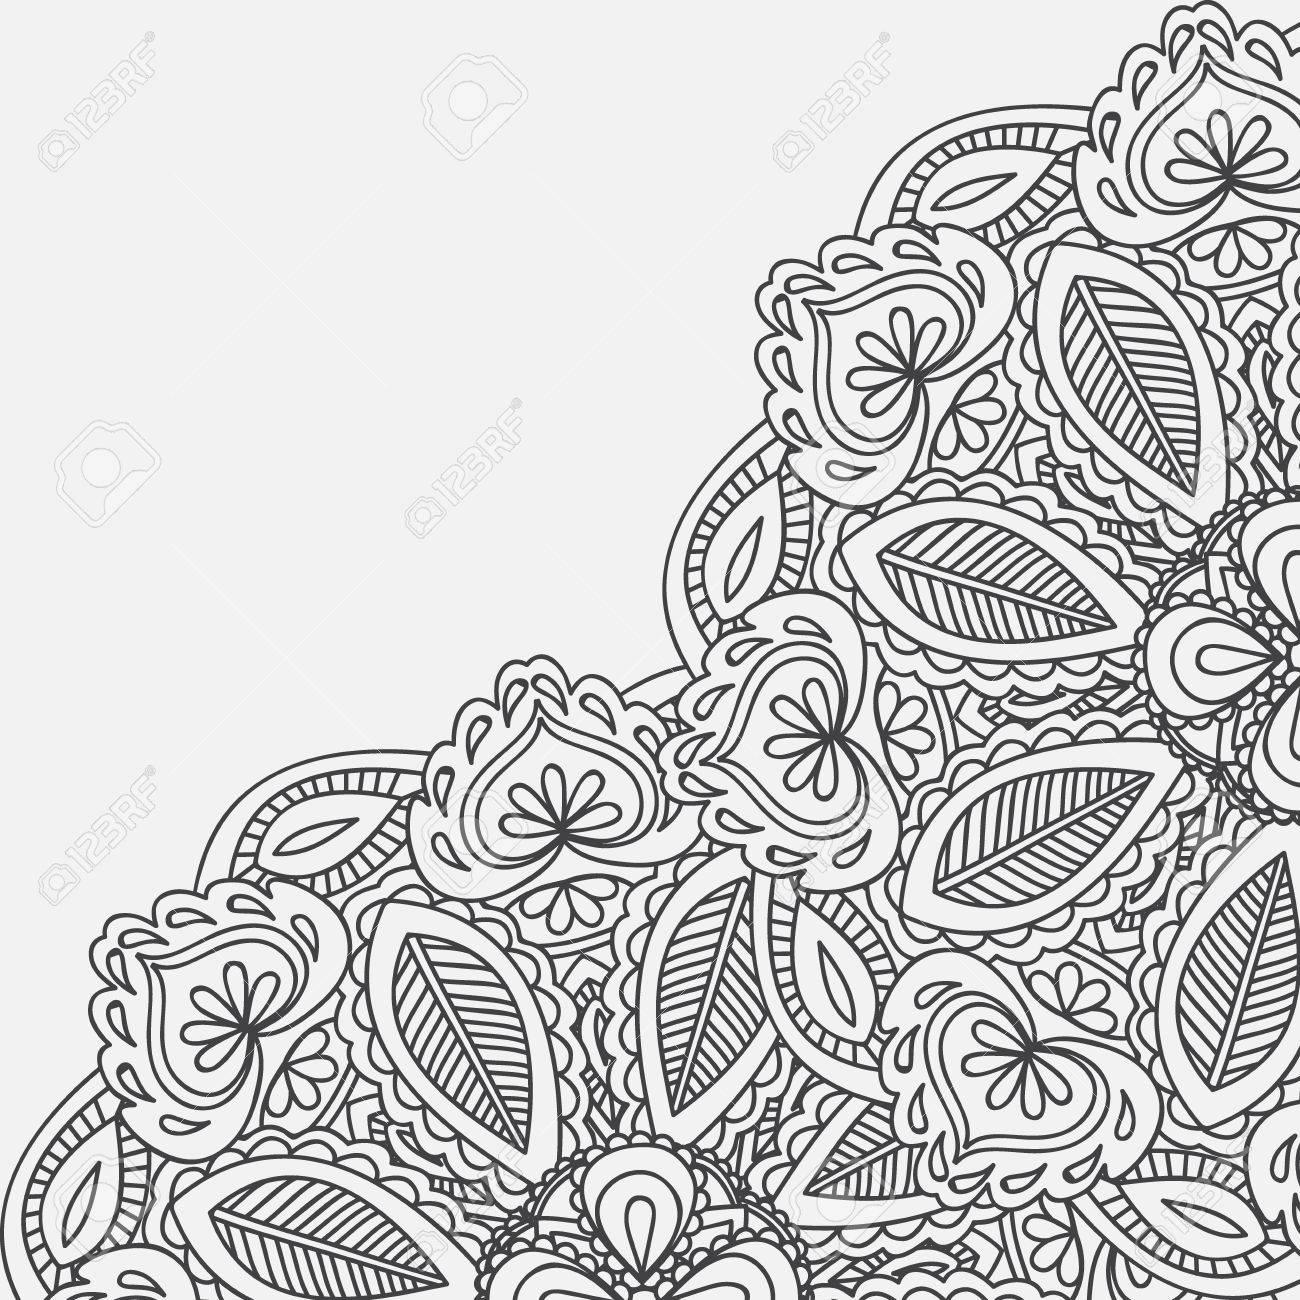 Henna Mehndi Card Template Mehndi Invitation Design Element